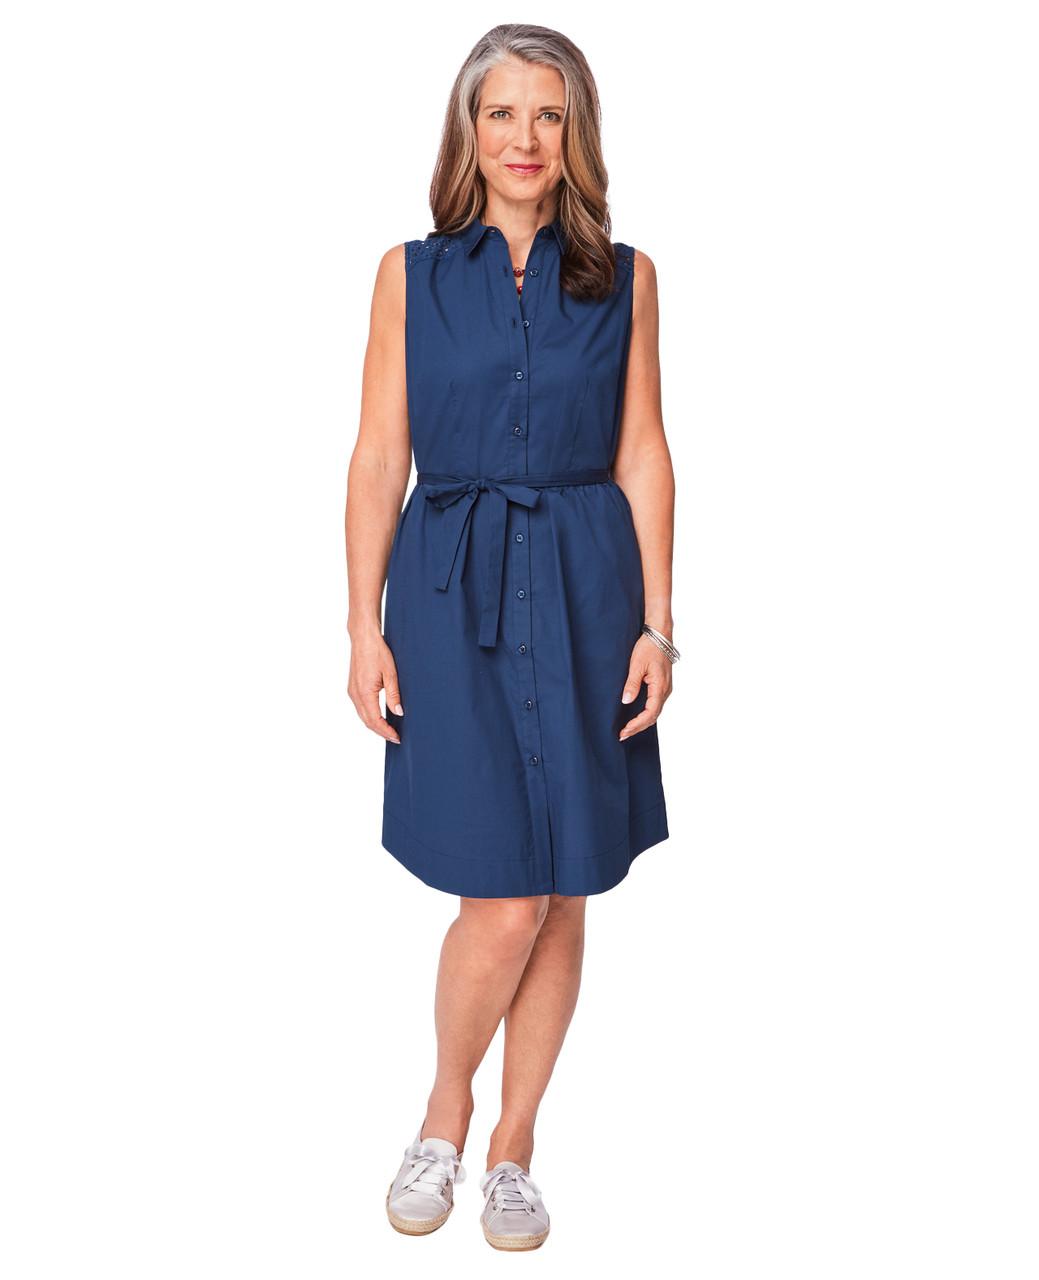 05da122a4c Women's Marine Navy Blue Sleeveless Poplin Shirt Dress | Northern ...